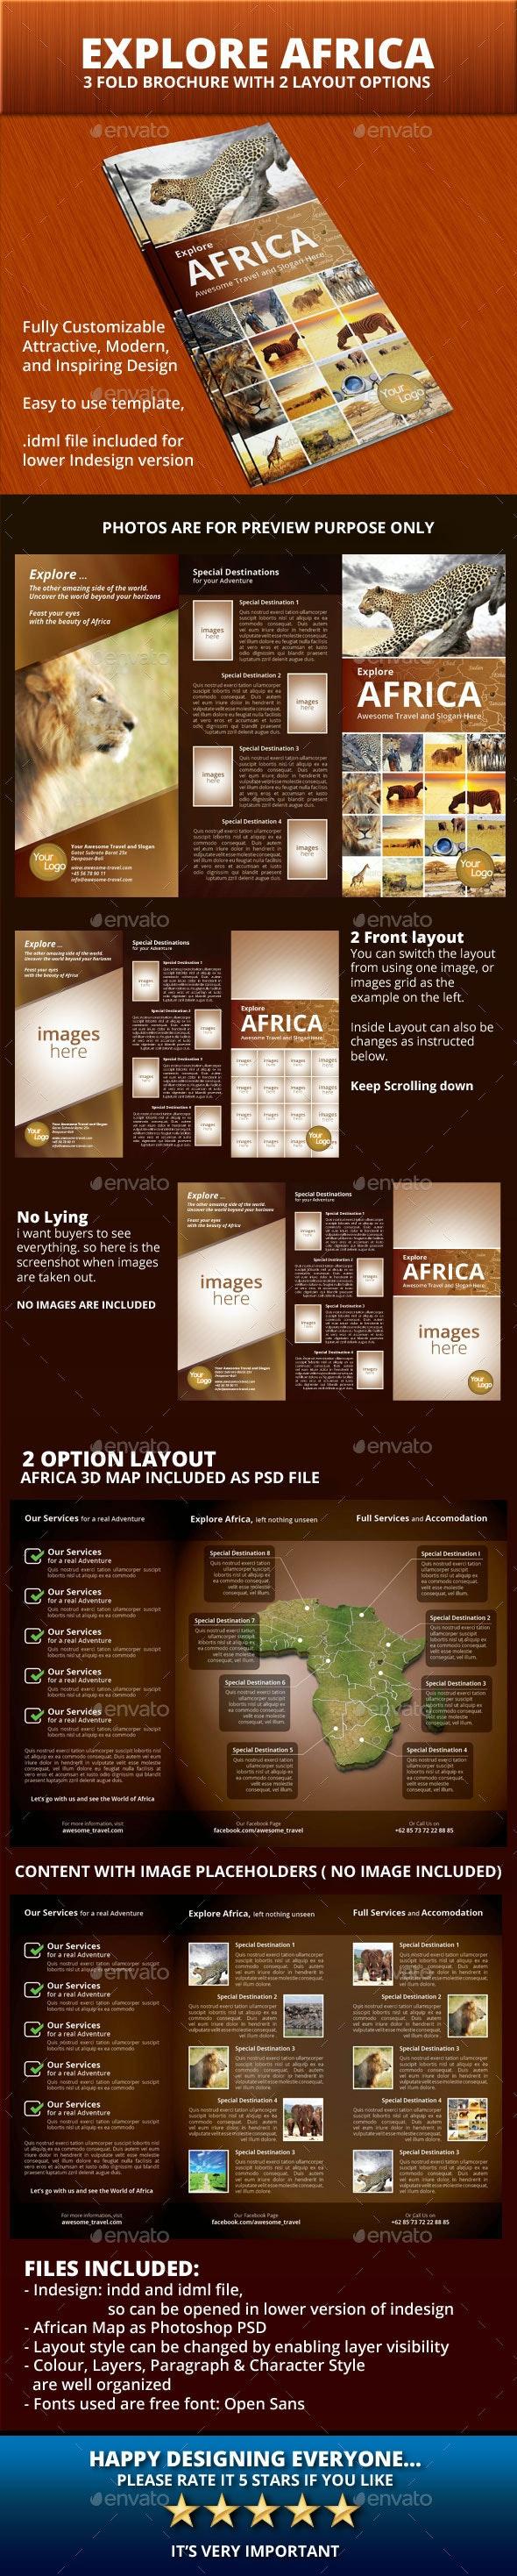 Explore Africa Trifold Brochure - Informational Brochures